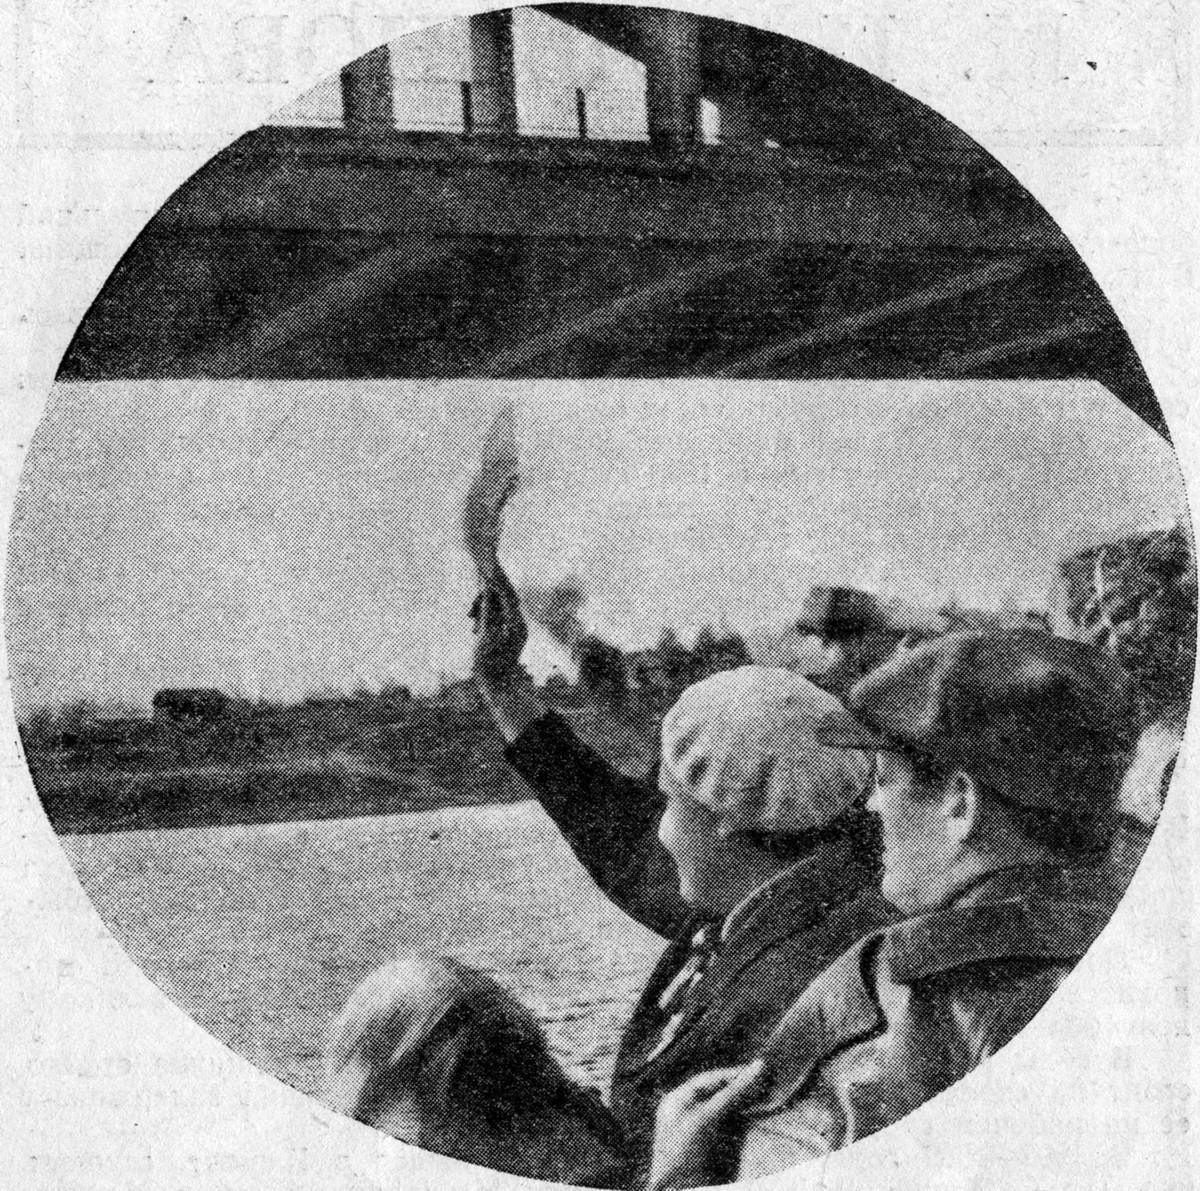 37 2 мая 1937 Химкинский жд мост. Журнал 'Огонёк' 1937 №16-17 (20 июня). Фото П.Трошкина